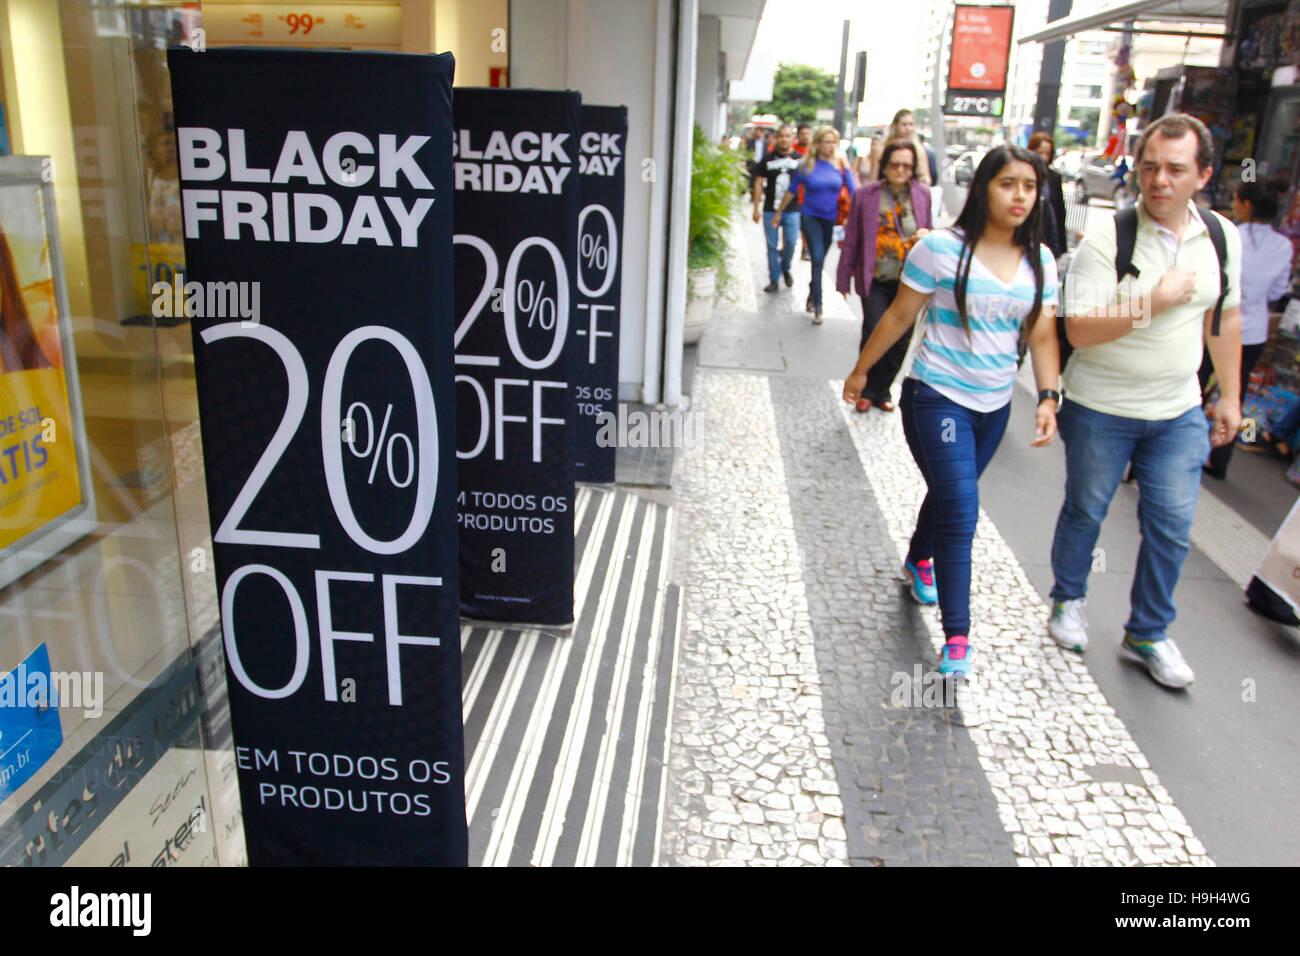 SÃO PAULO, SP - 23.11.2016: BLACK FRIDAY Brasilien 2016 - findet statt am kommenden Freitag (25) schwarzen Stockbild